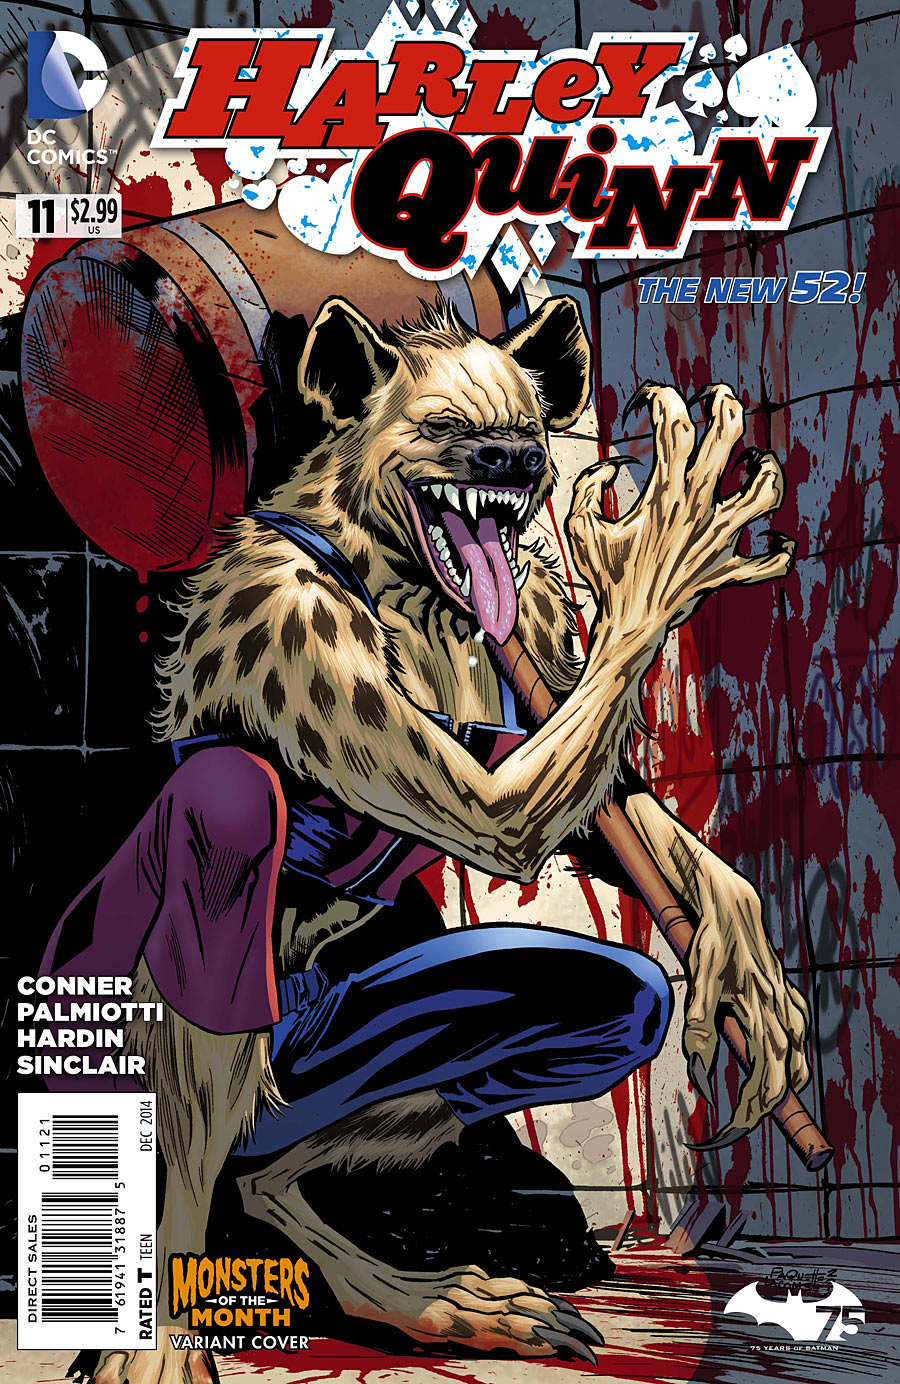 Harley Quinn Vol 2 11 Monsters of the Month Variant.jpg